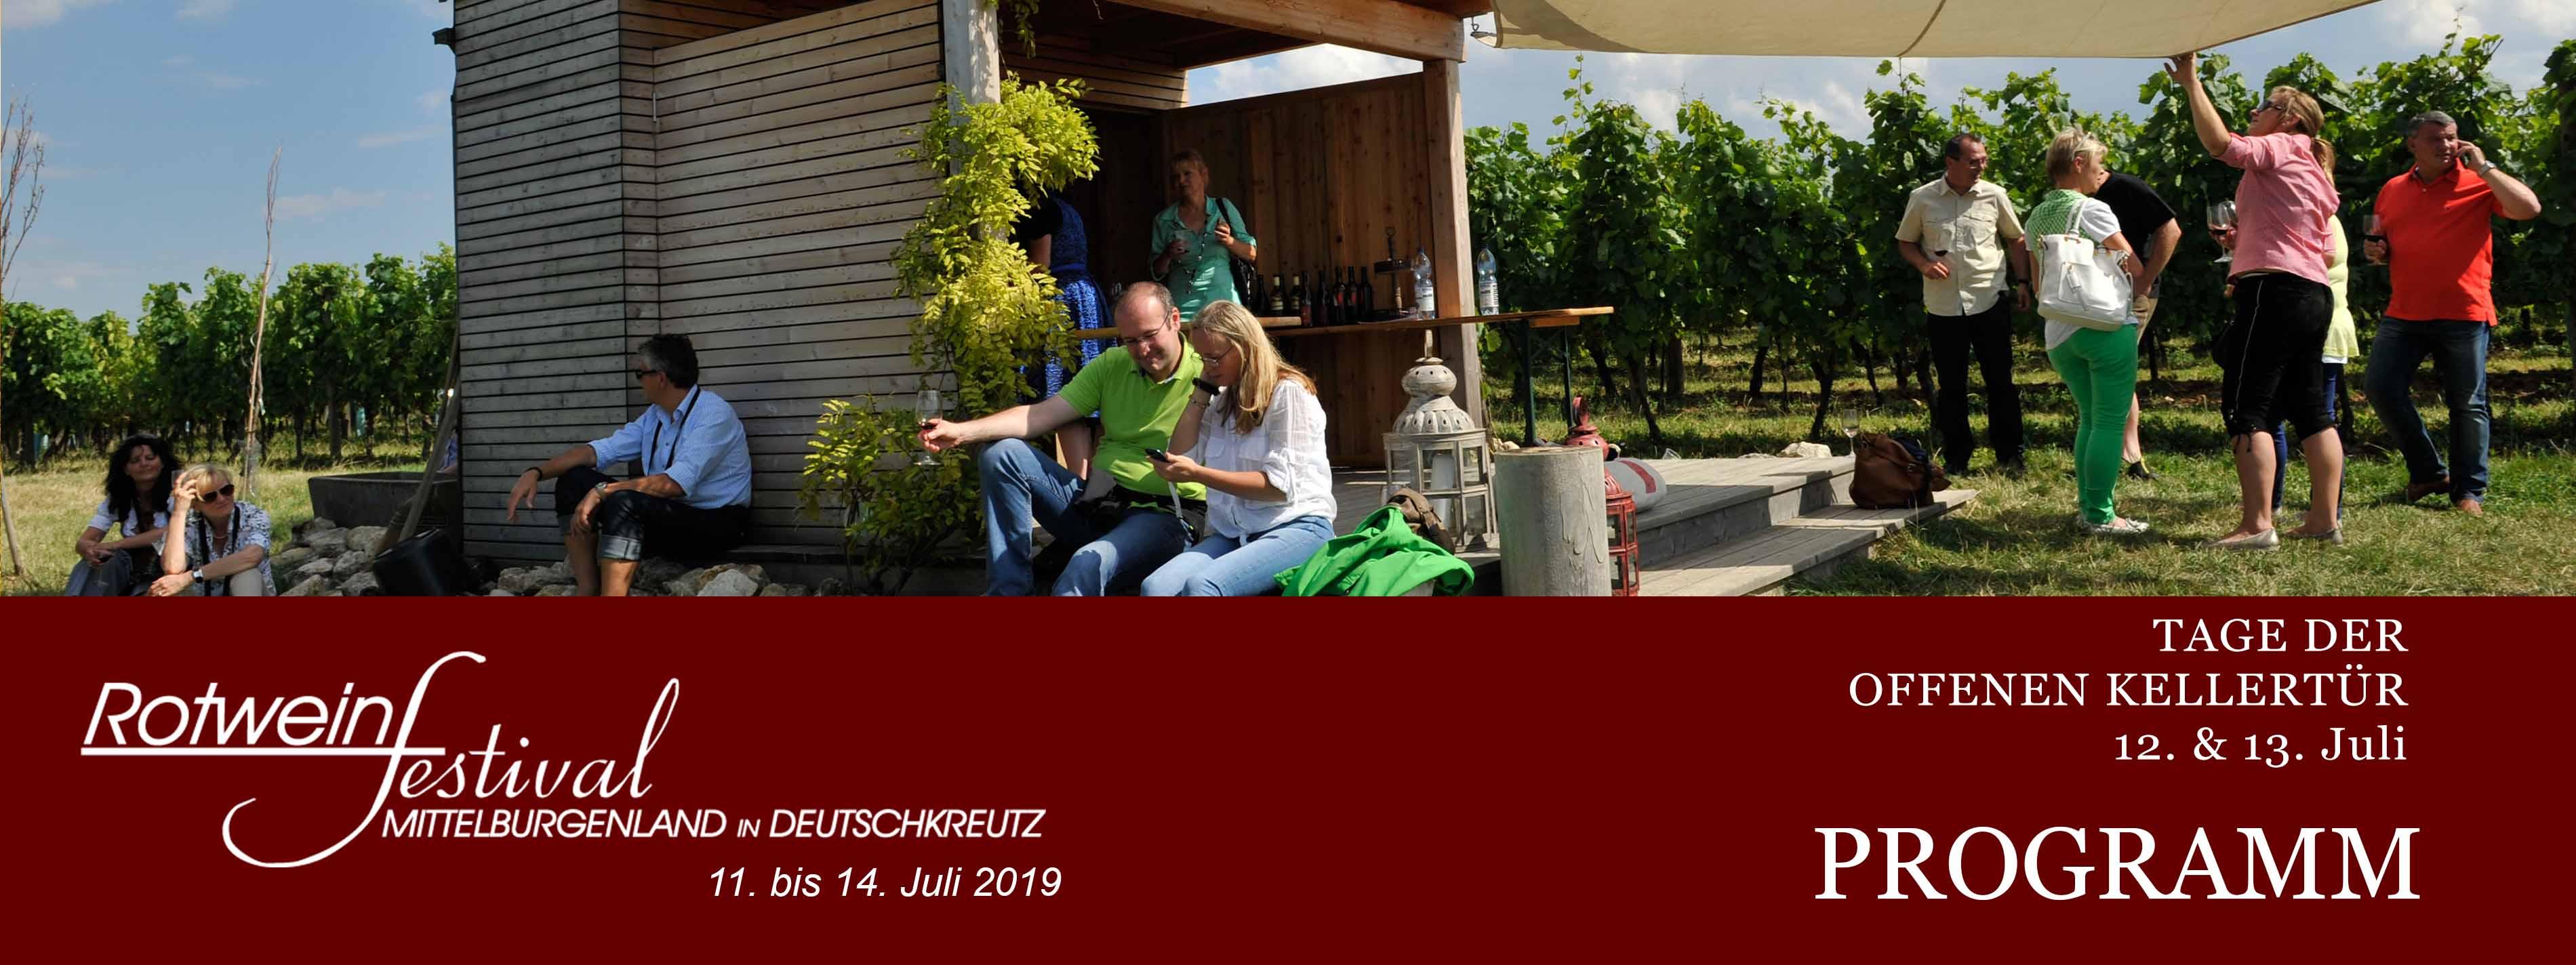 Programm Rotweinfestival 2019